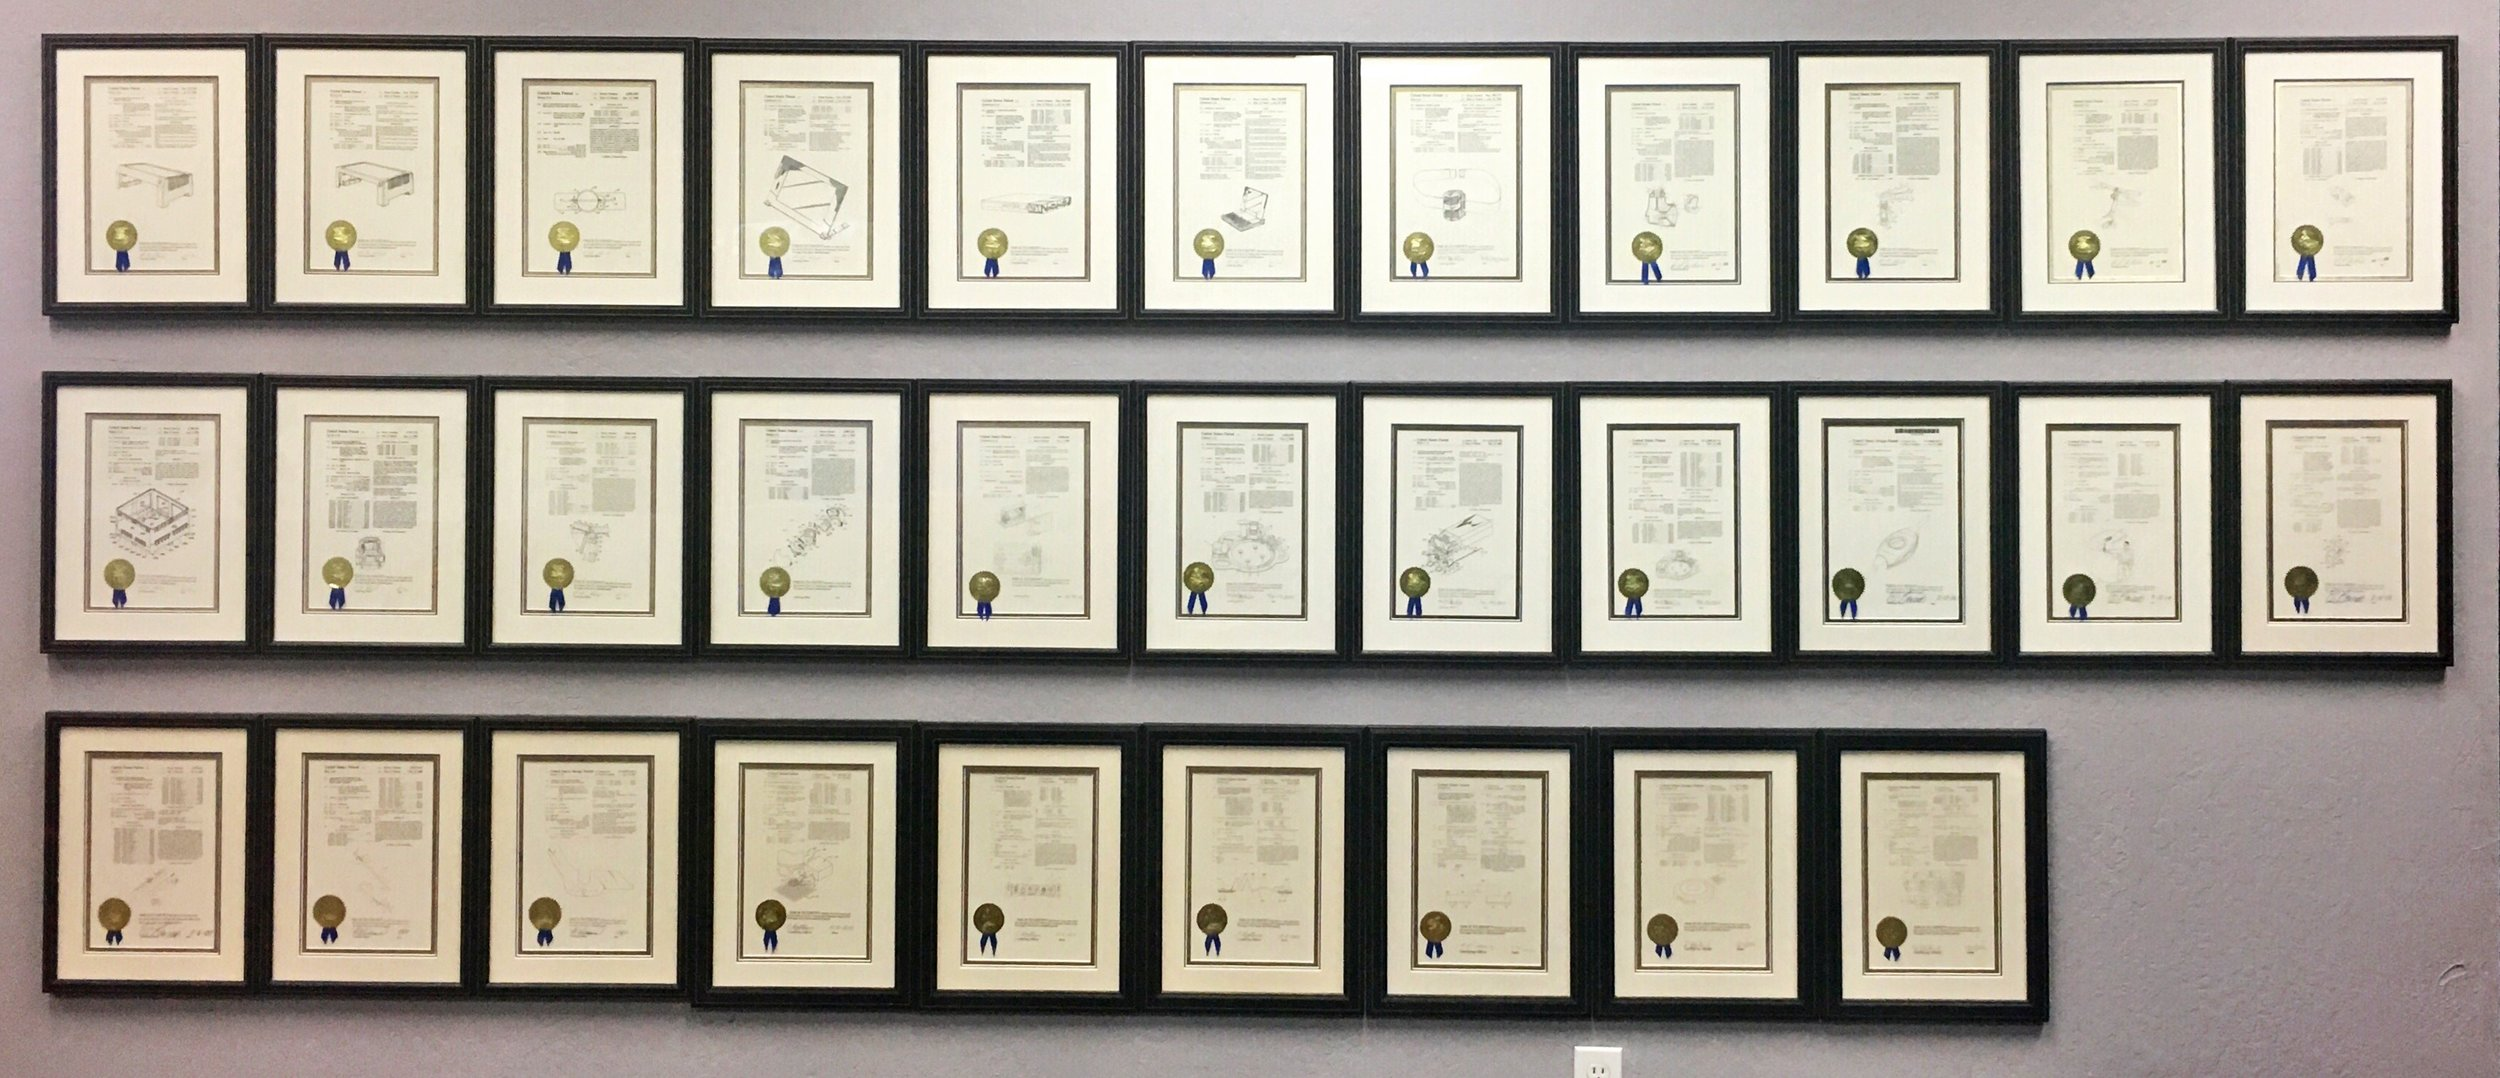 patent Wall.JPG